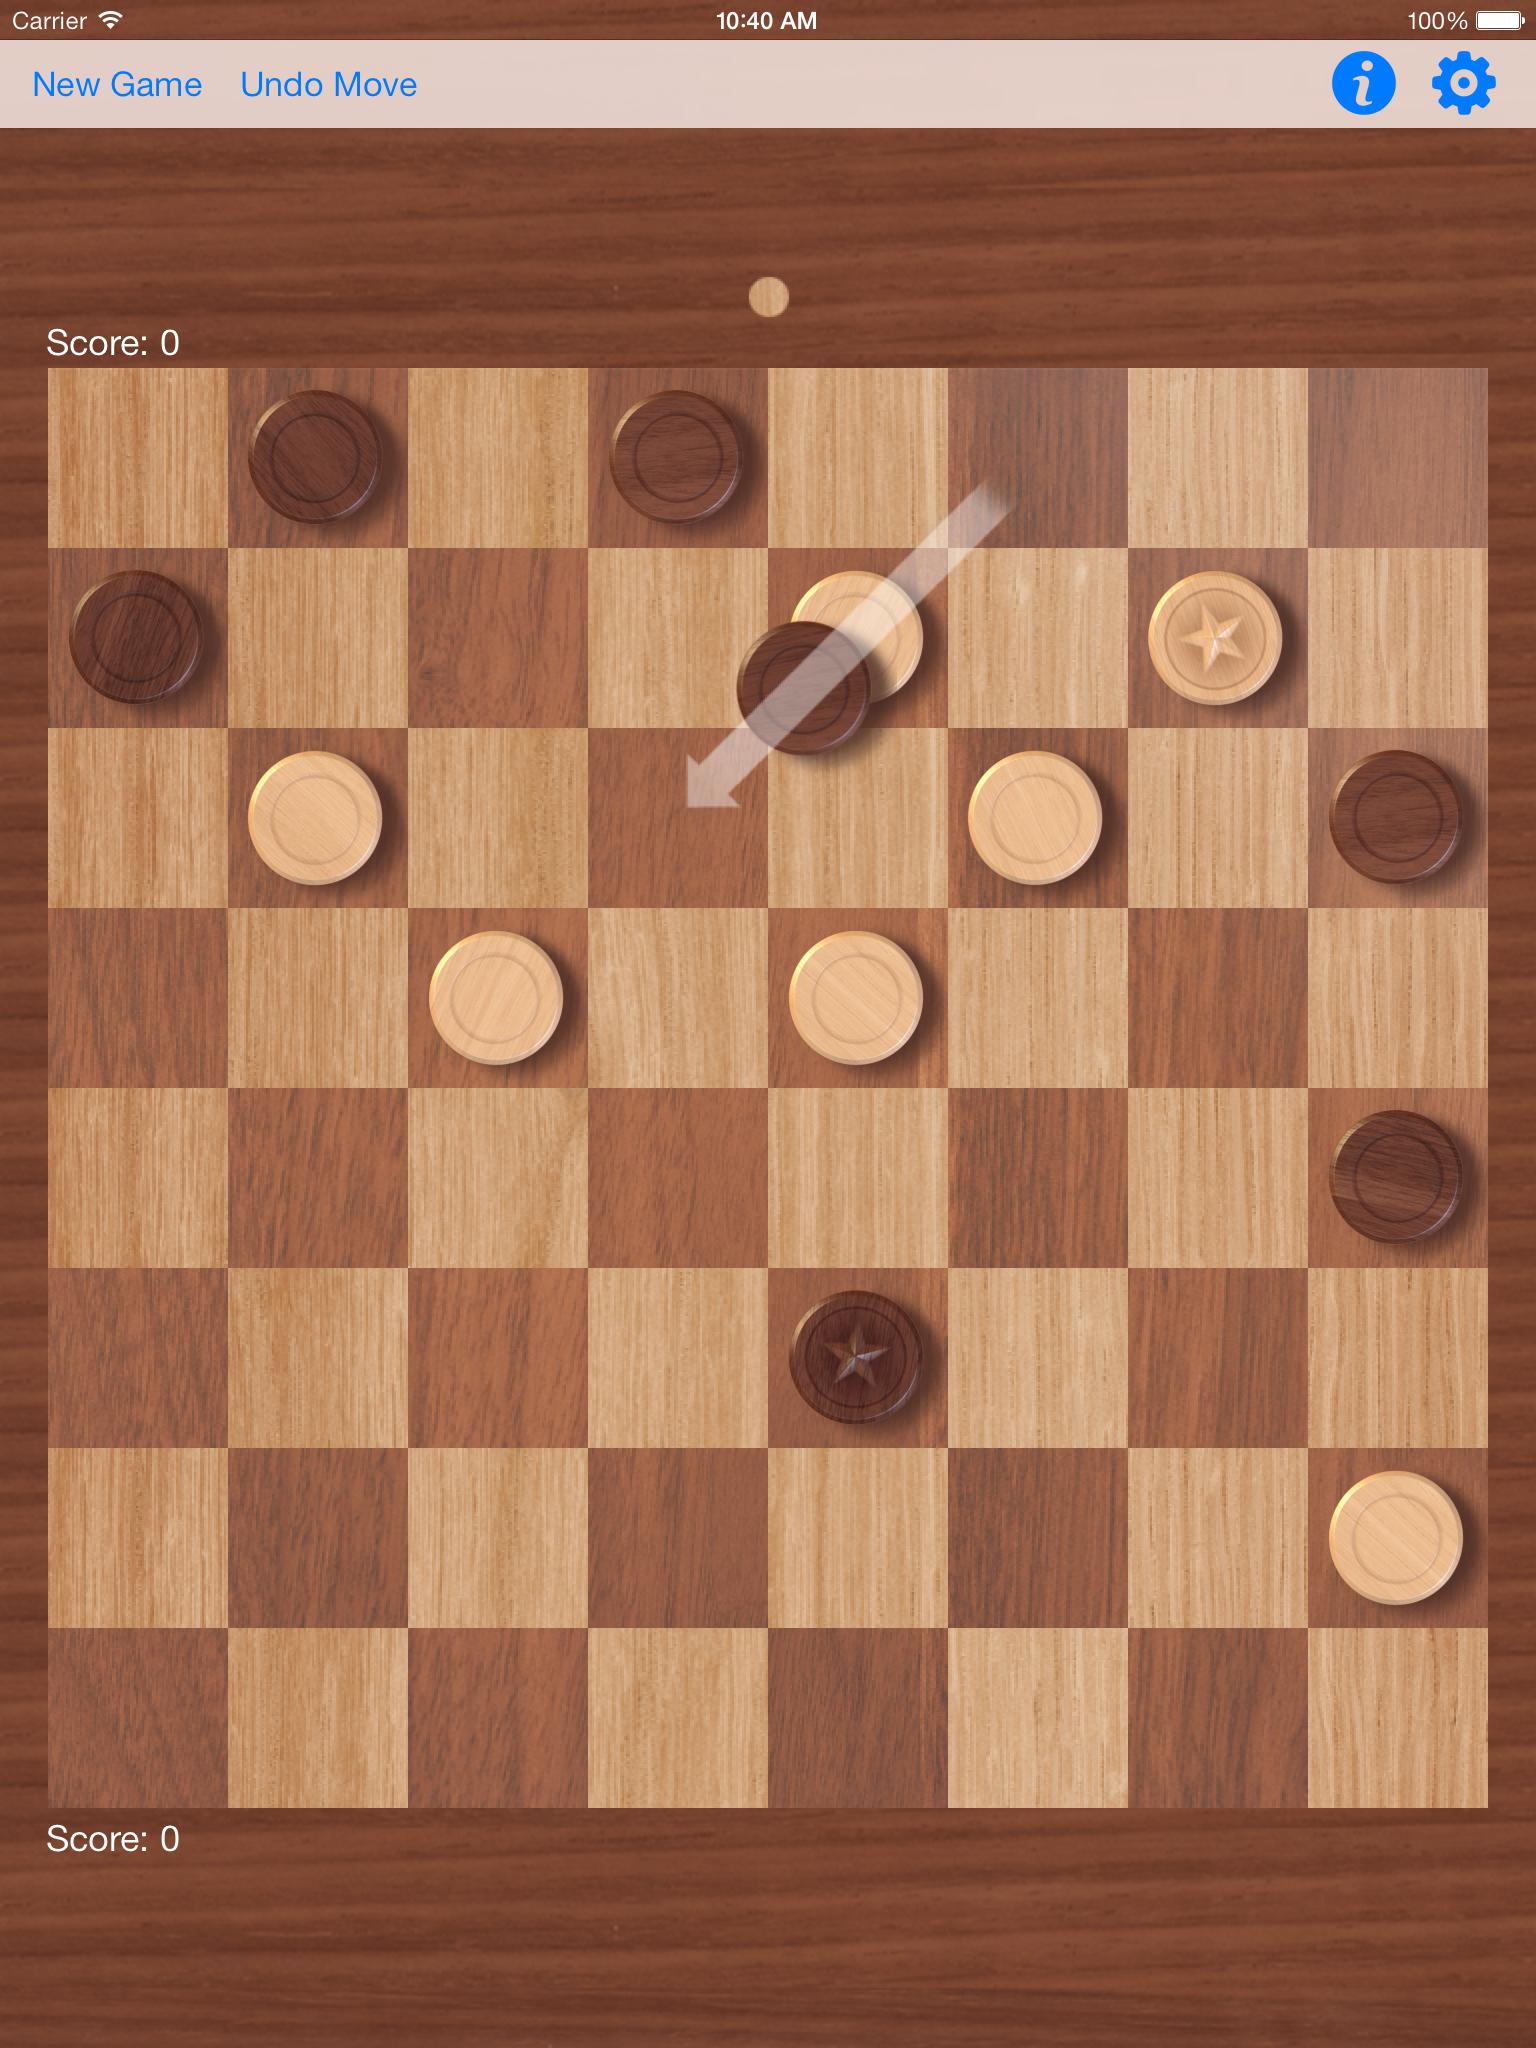 iOS Simulator Screen shot Oct 15, 2013, 10.40.13 AM.png